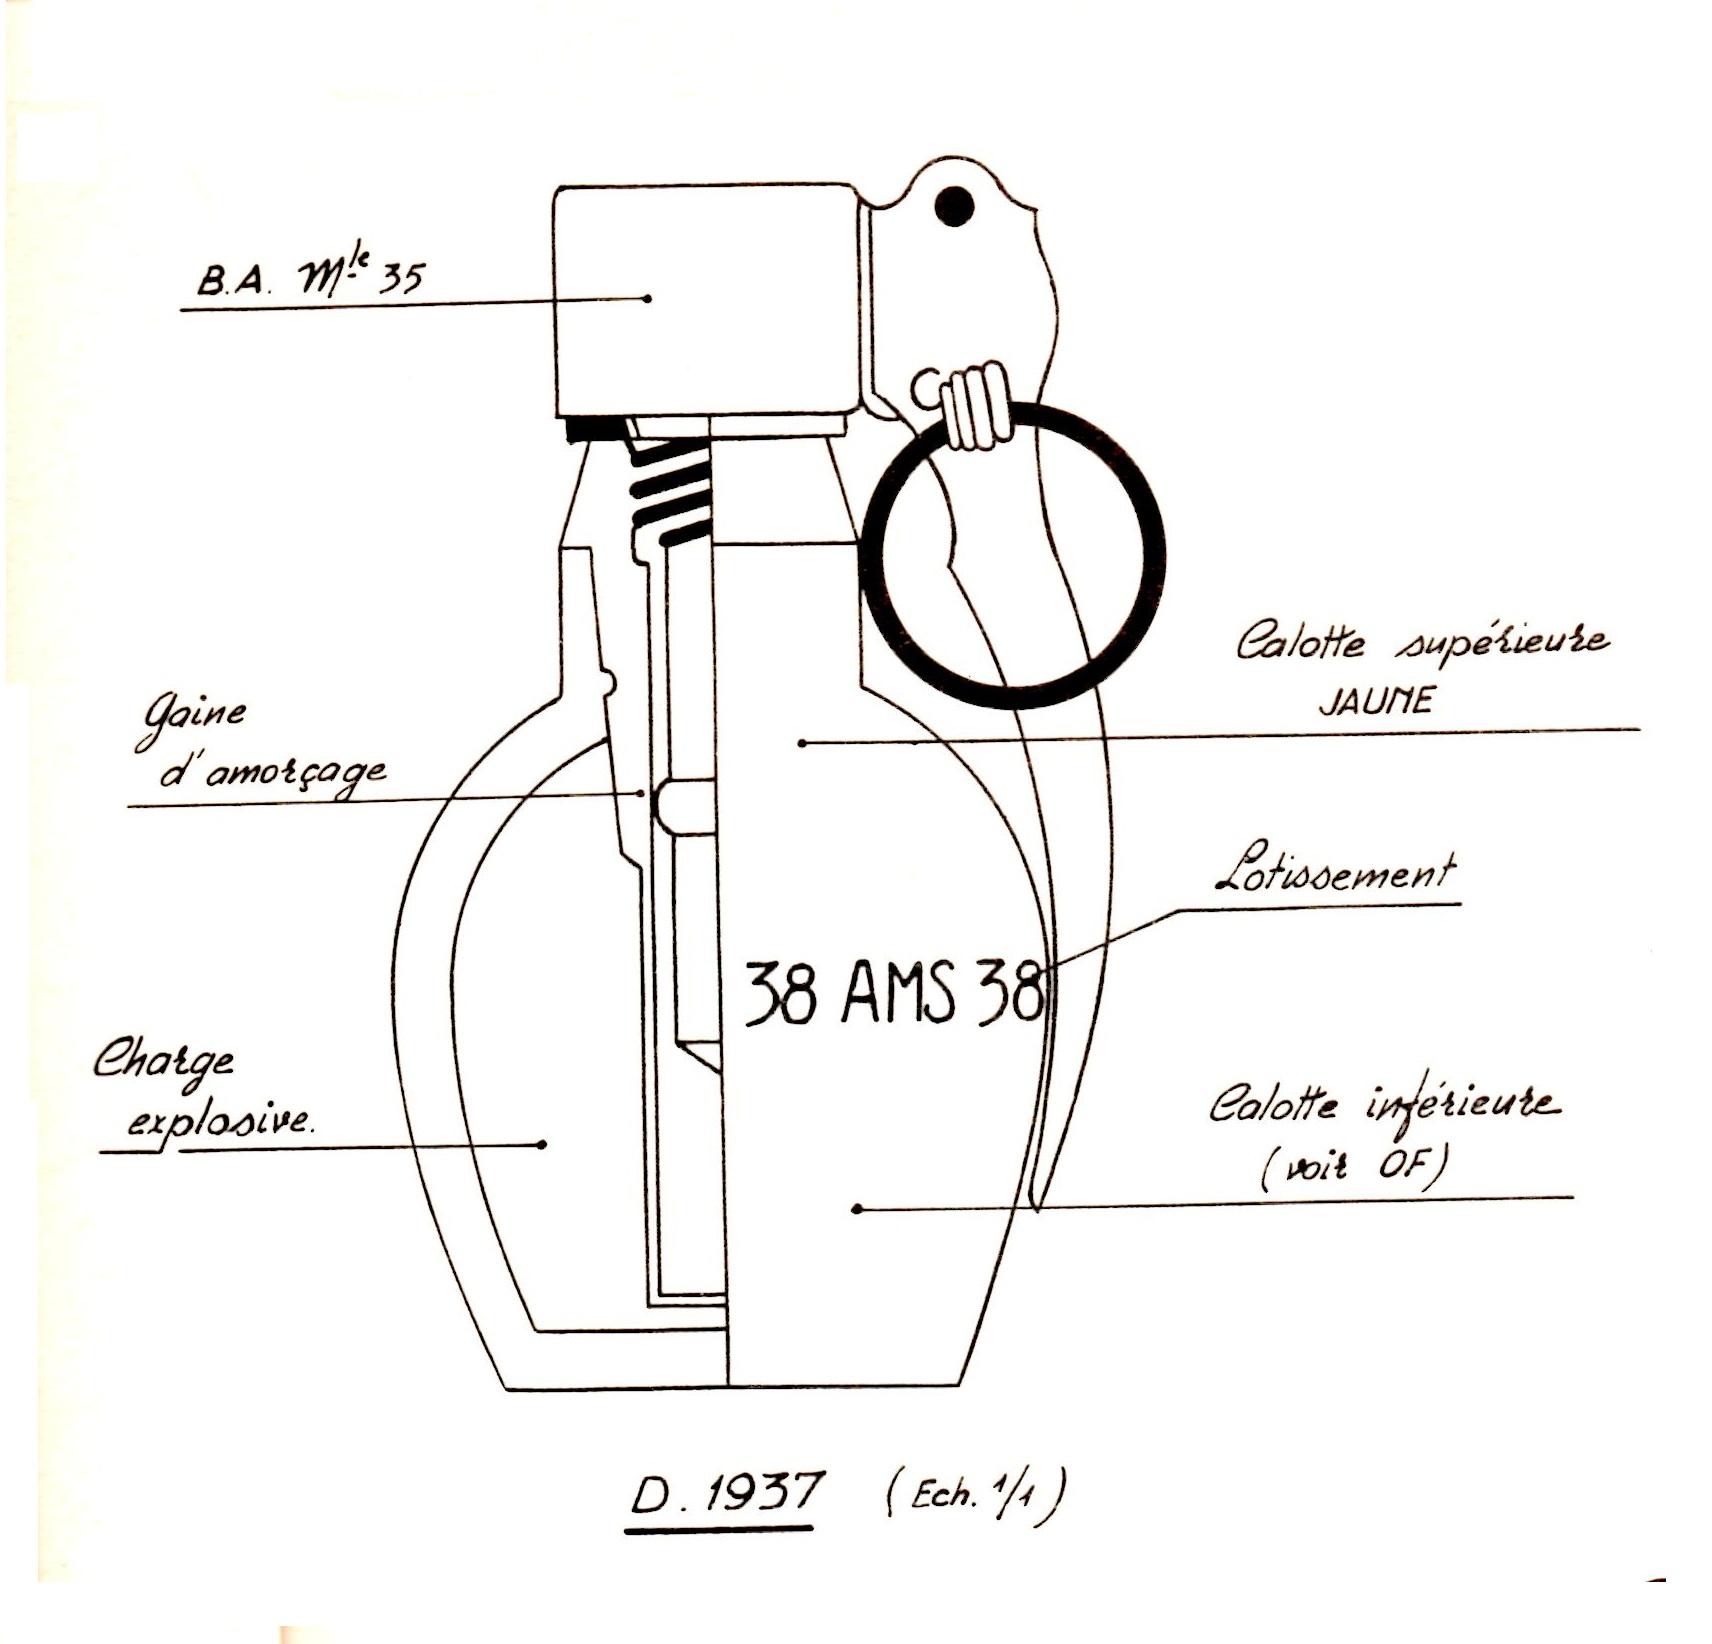 Df 1937